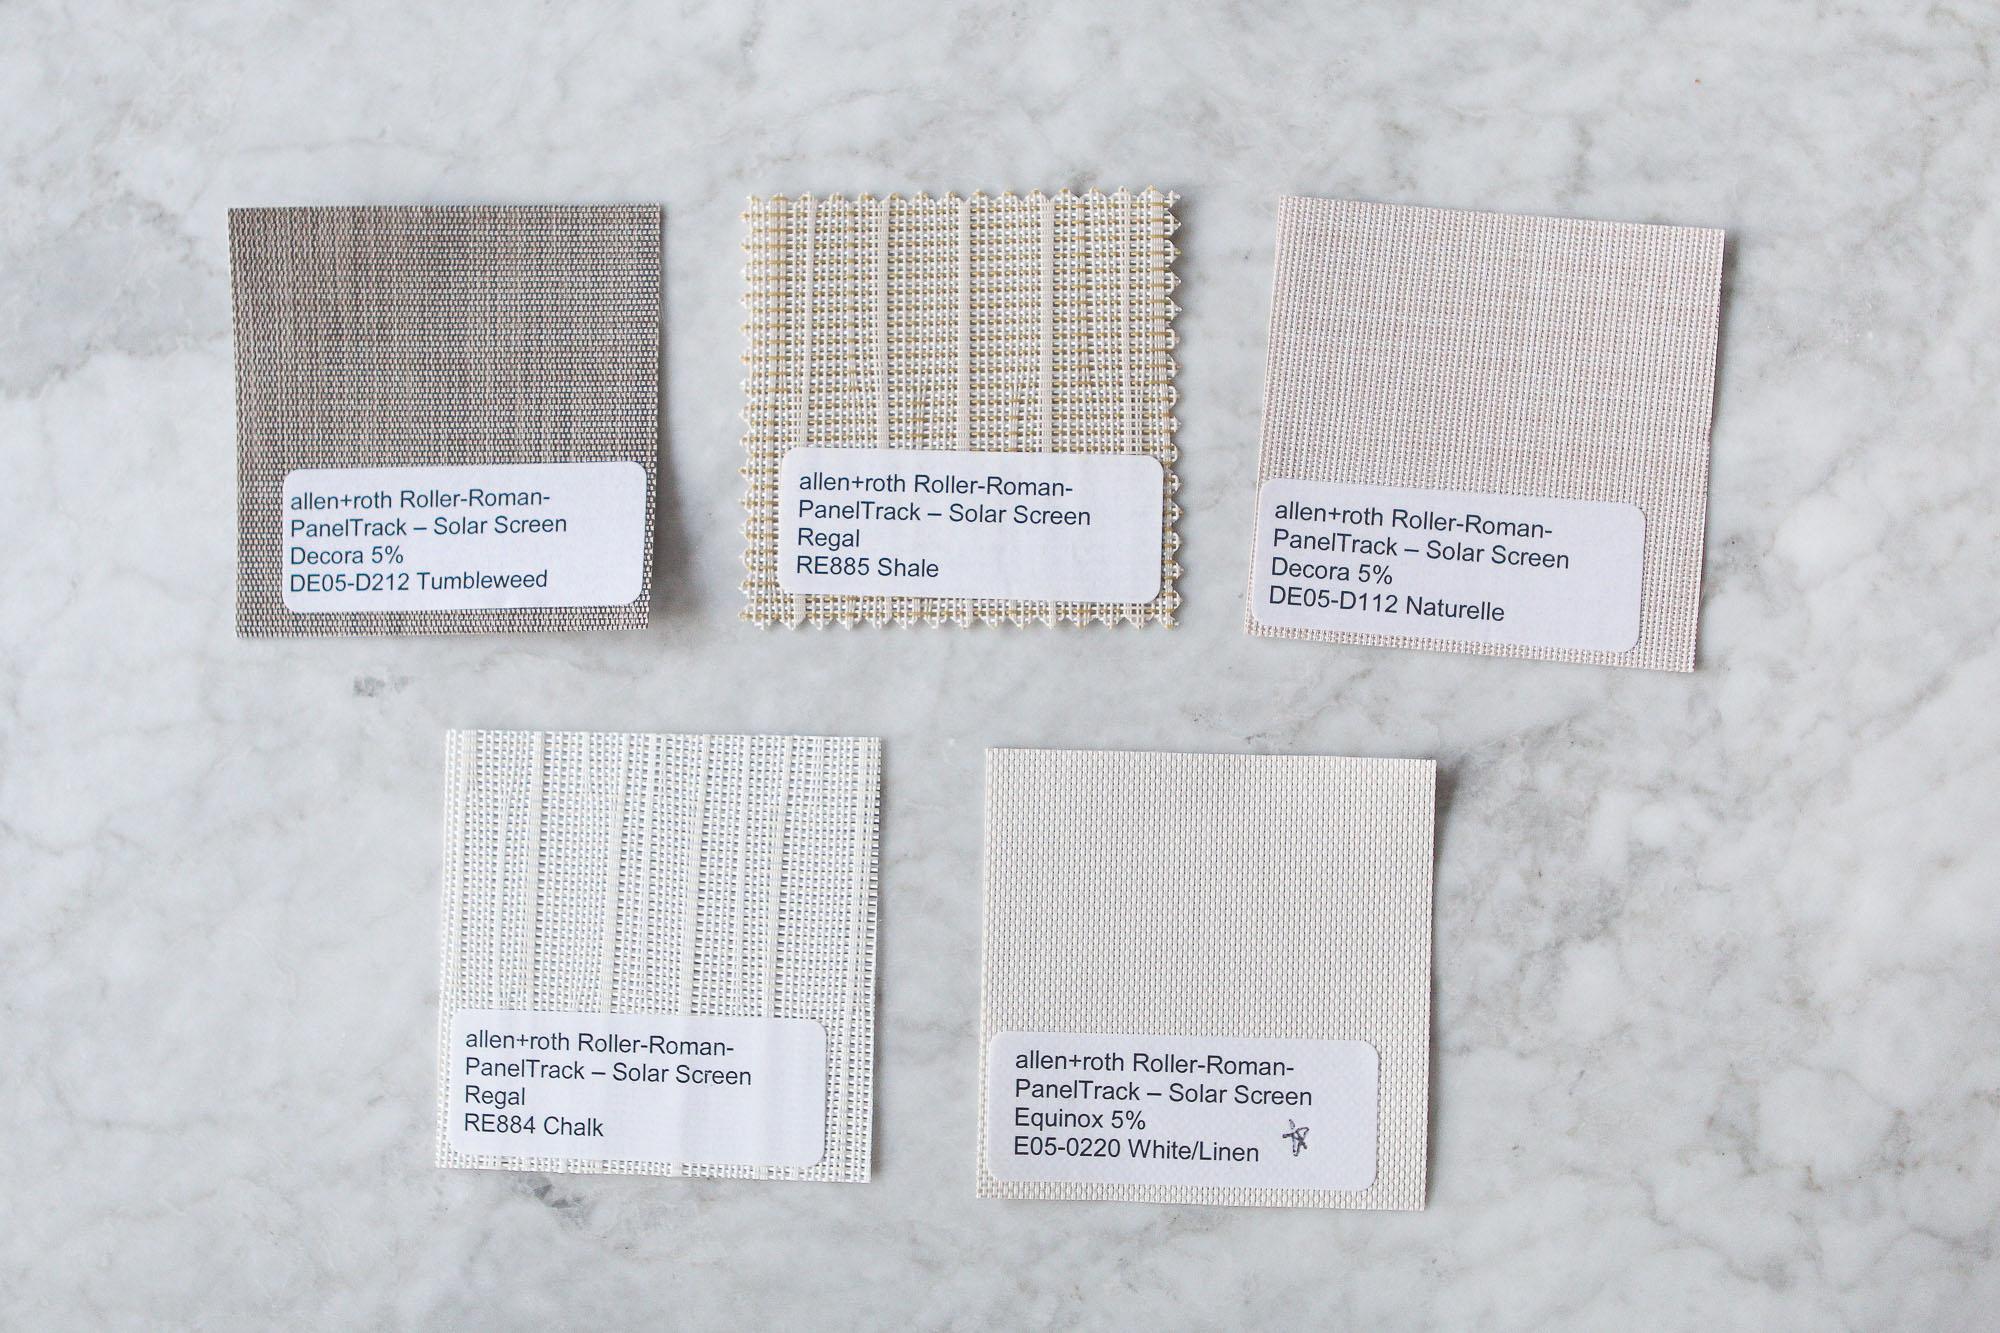 Variety of window shade fabrics